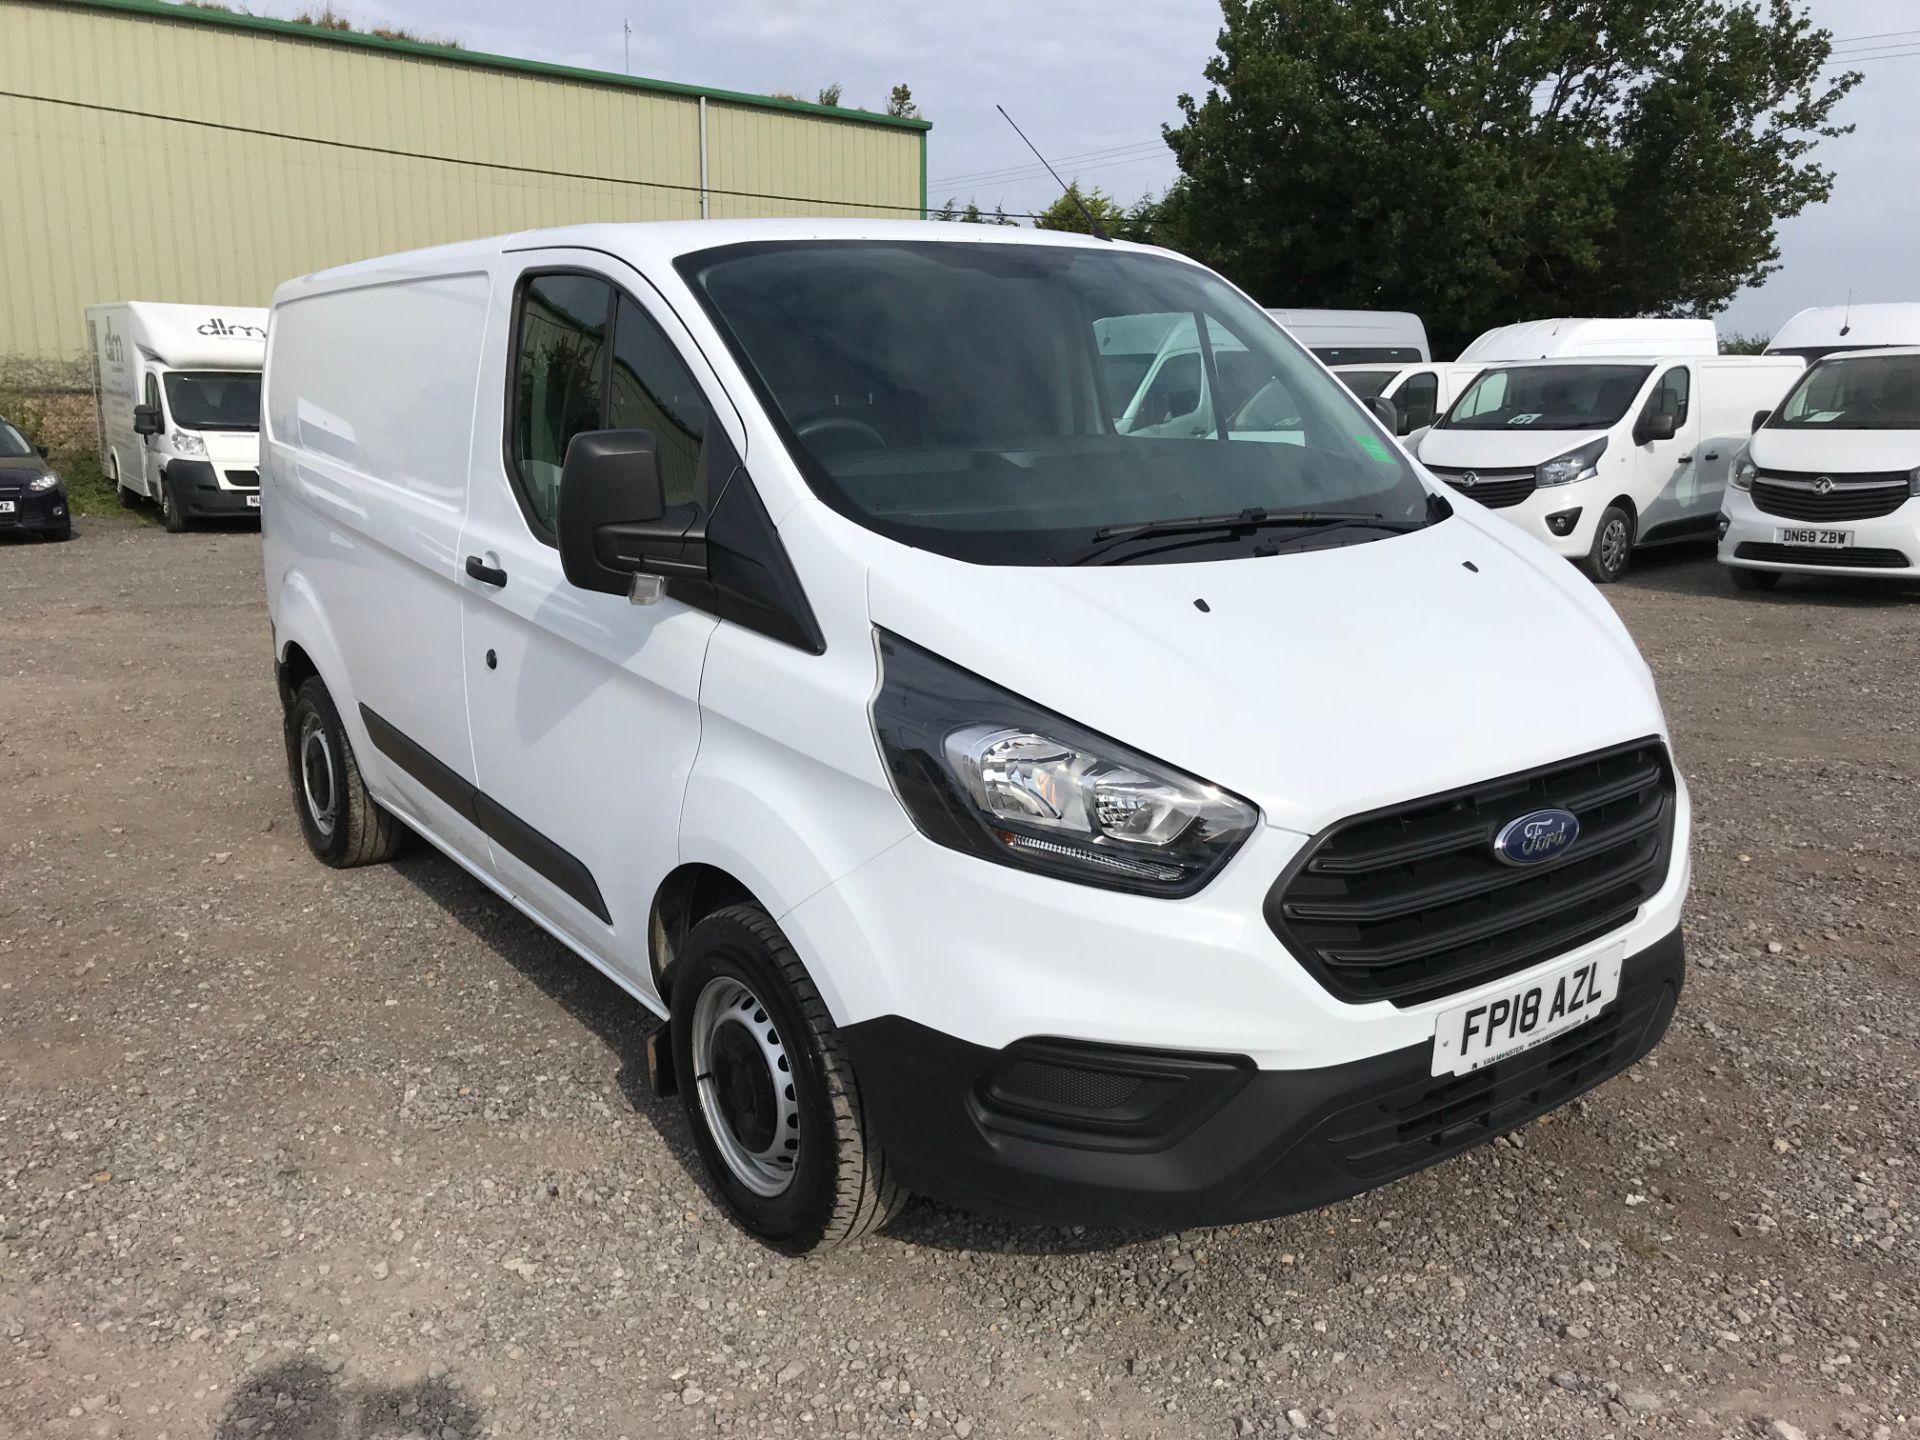 2018 Ford Transit Custom 2.0 Tdci 105Ps Low Roof Van (FP18AZL)